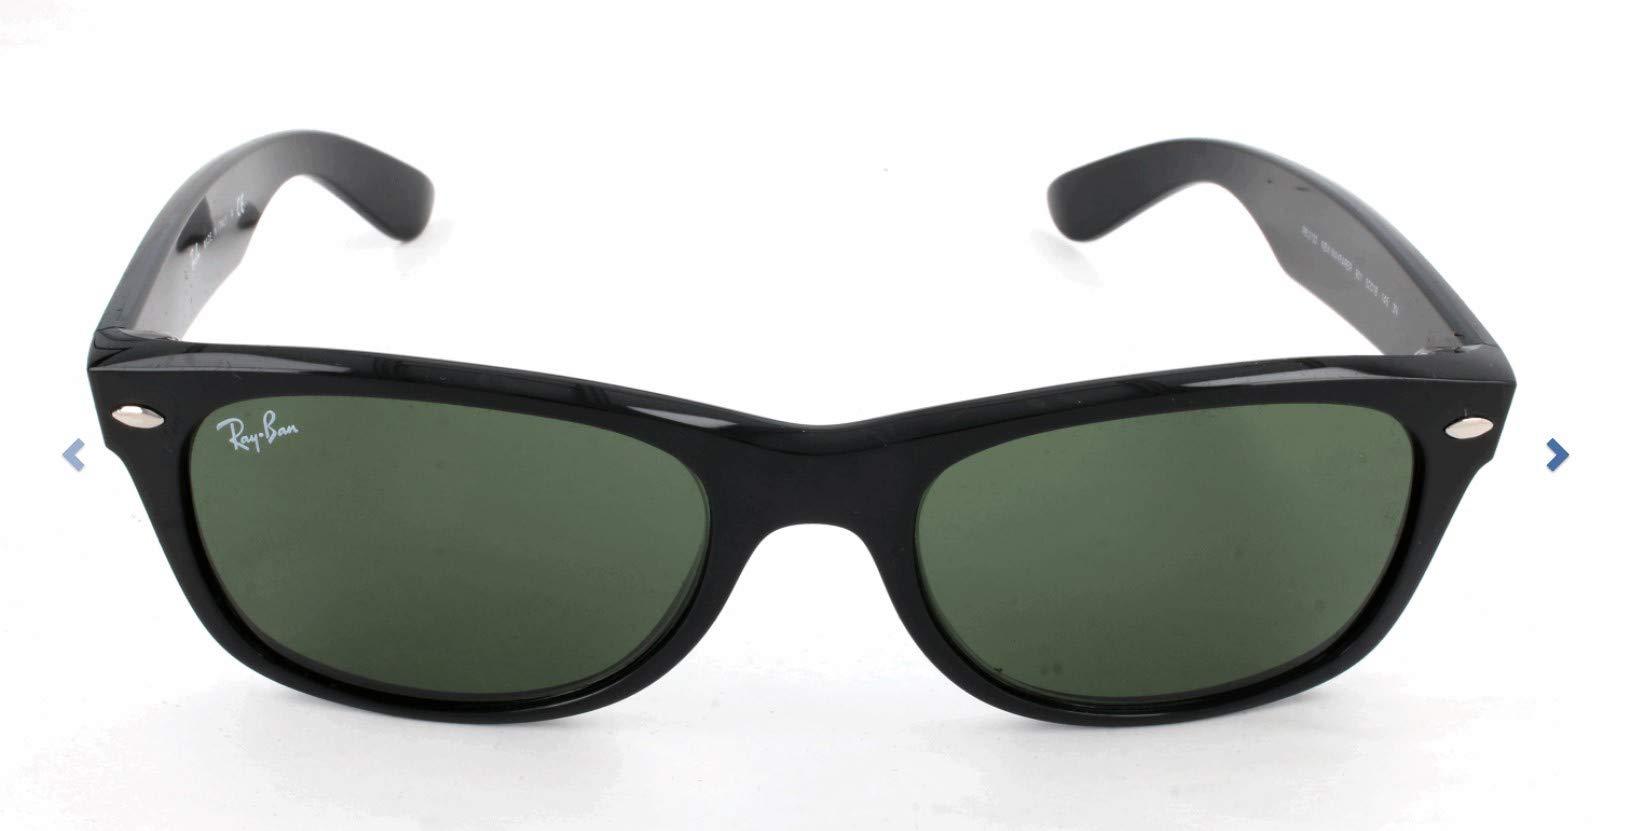 Ray-Ban RB2132 New Wayfarer Sunglasses, Black/Green, 55 mm by Ray-Ban